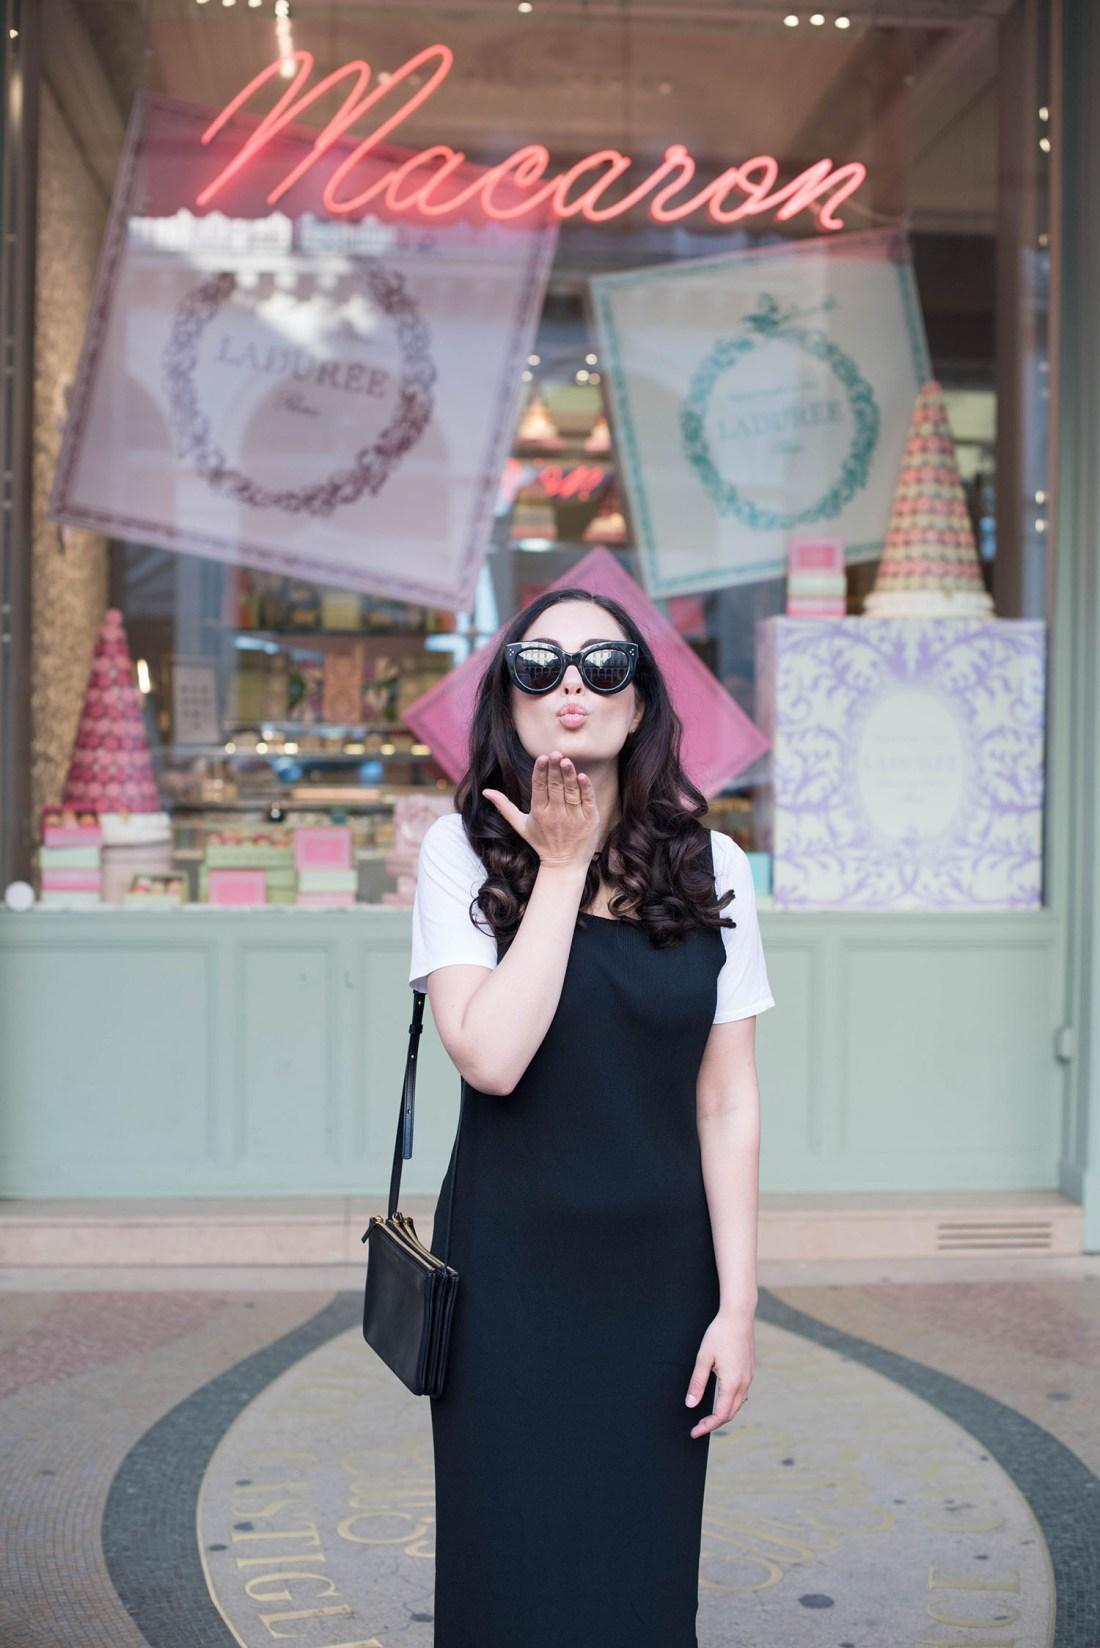 Portrait of brunette fashion blogger Cee Fardoe, wearing Celine Audrey sunglasses and blowing a kiss